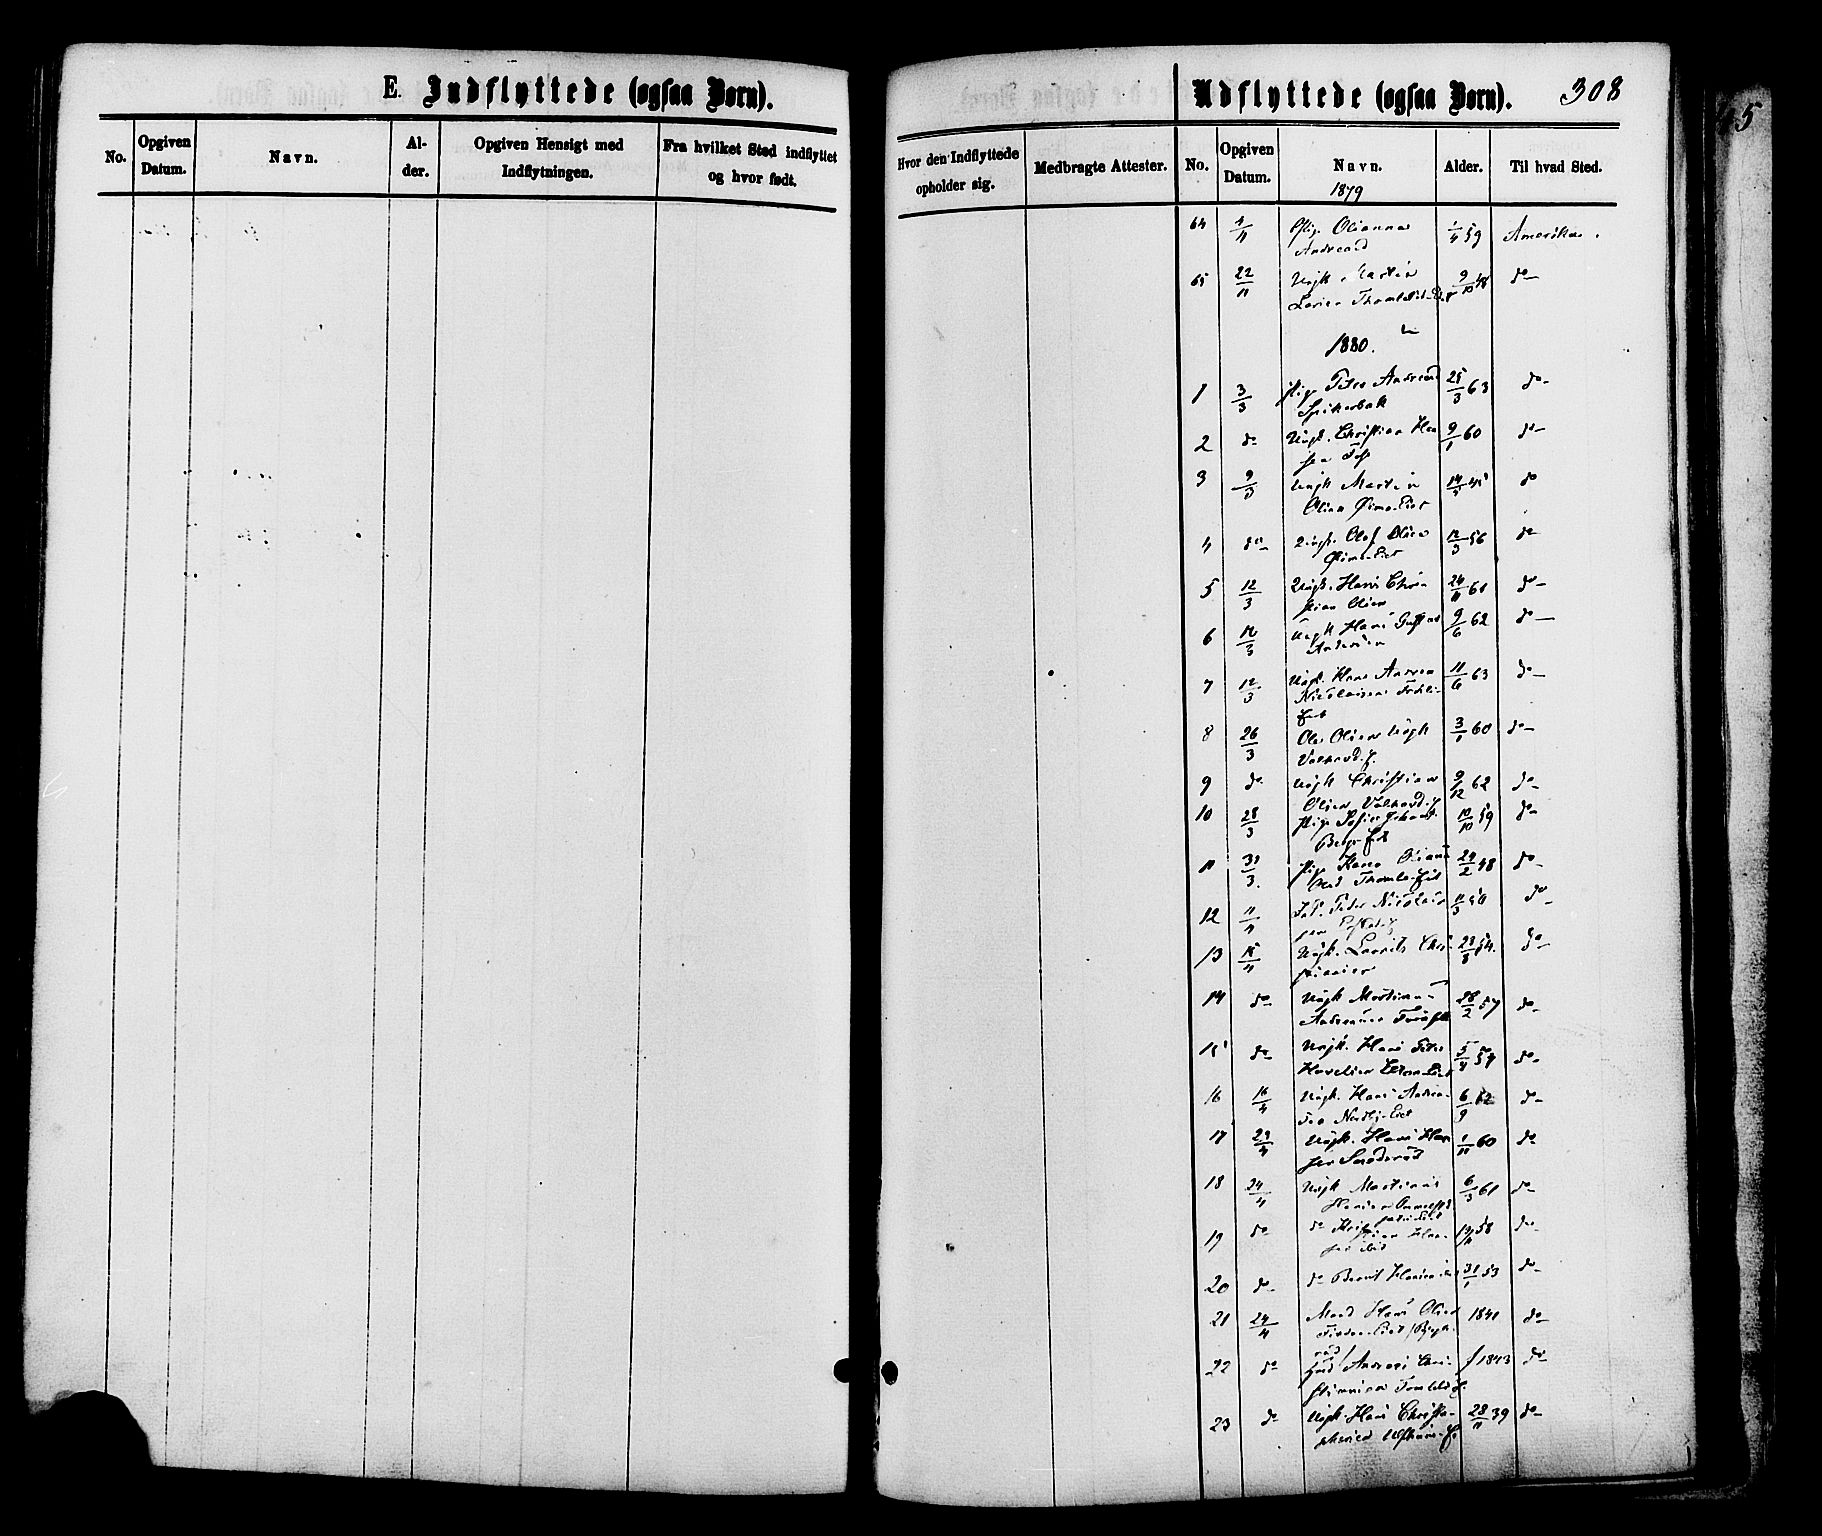 SAH, Nordre Land prestekontor, Ministerialbok nr. 2, 1872-1881, s. 308